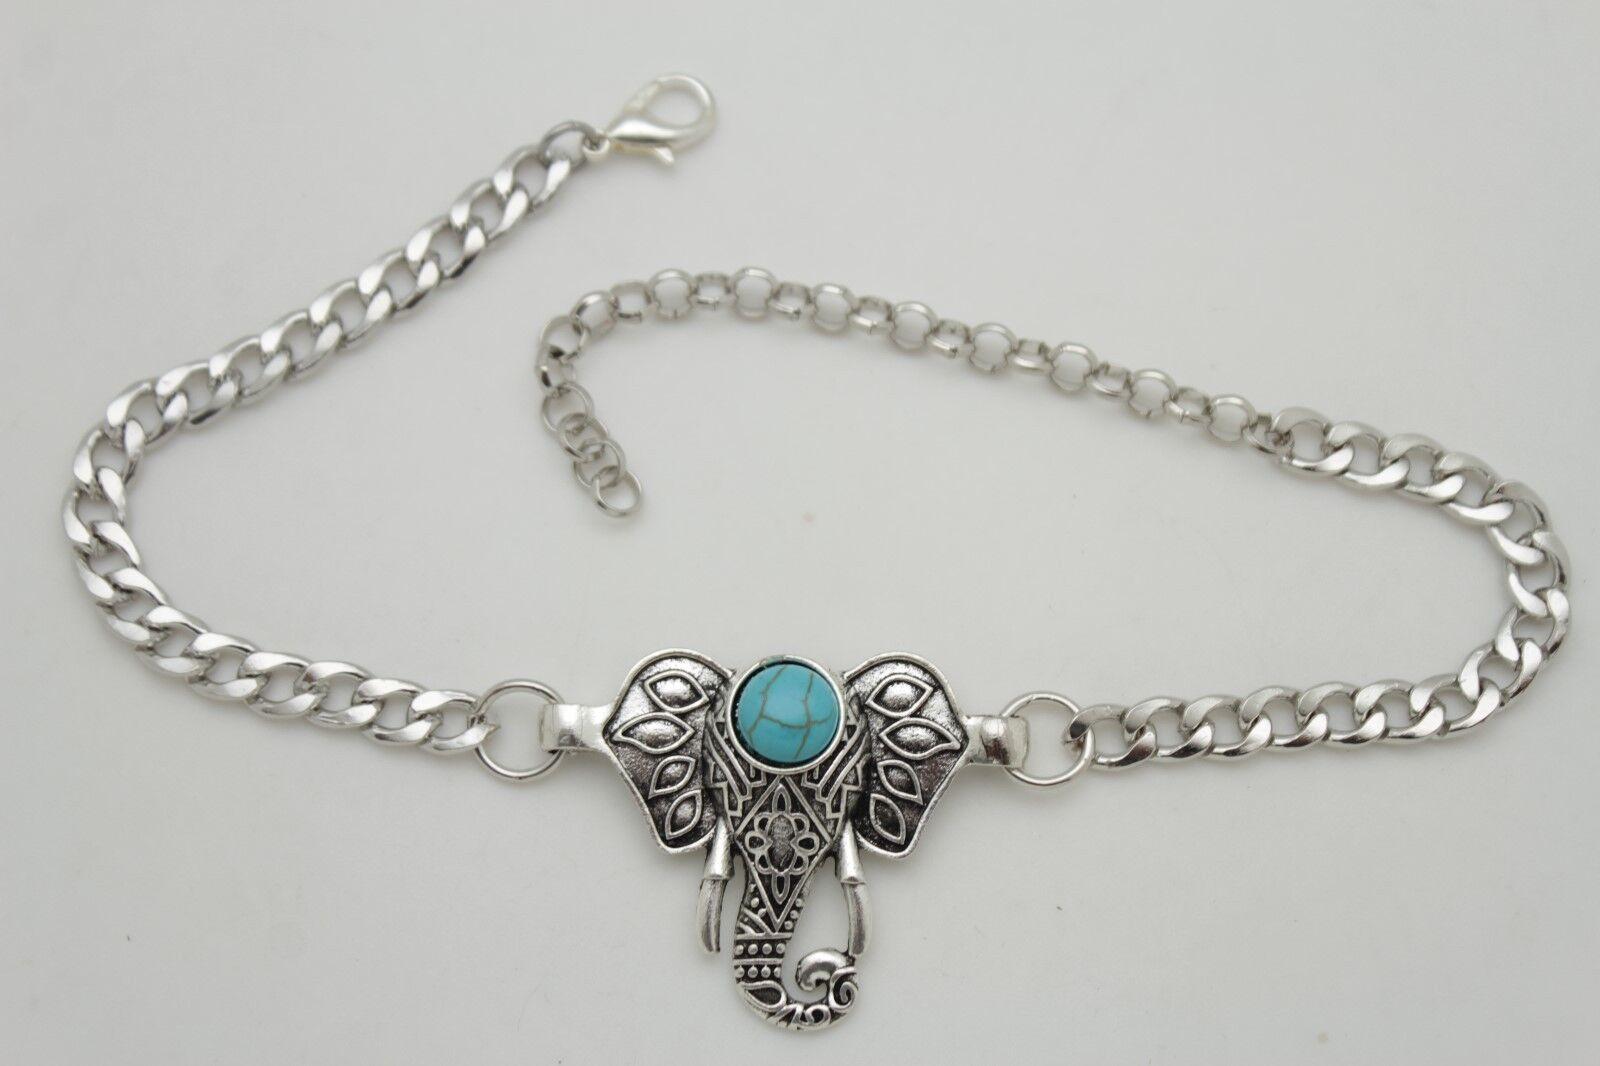 Fun Women Boot Chain Silver Metal Shoe Turquoise Blue Bead Indian Elephant Charm